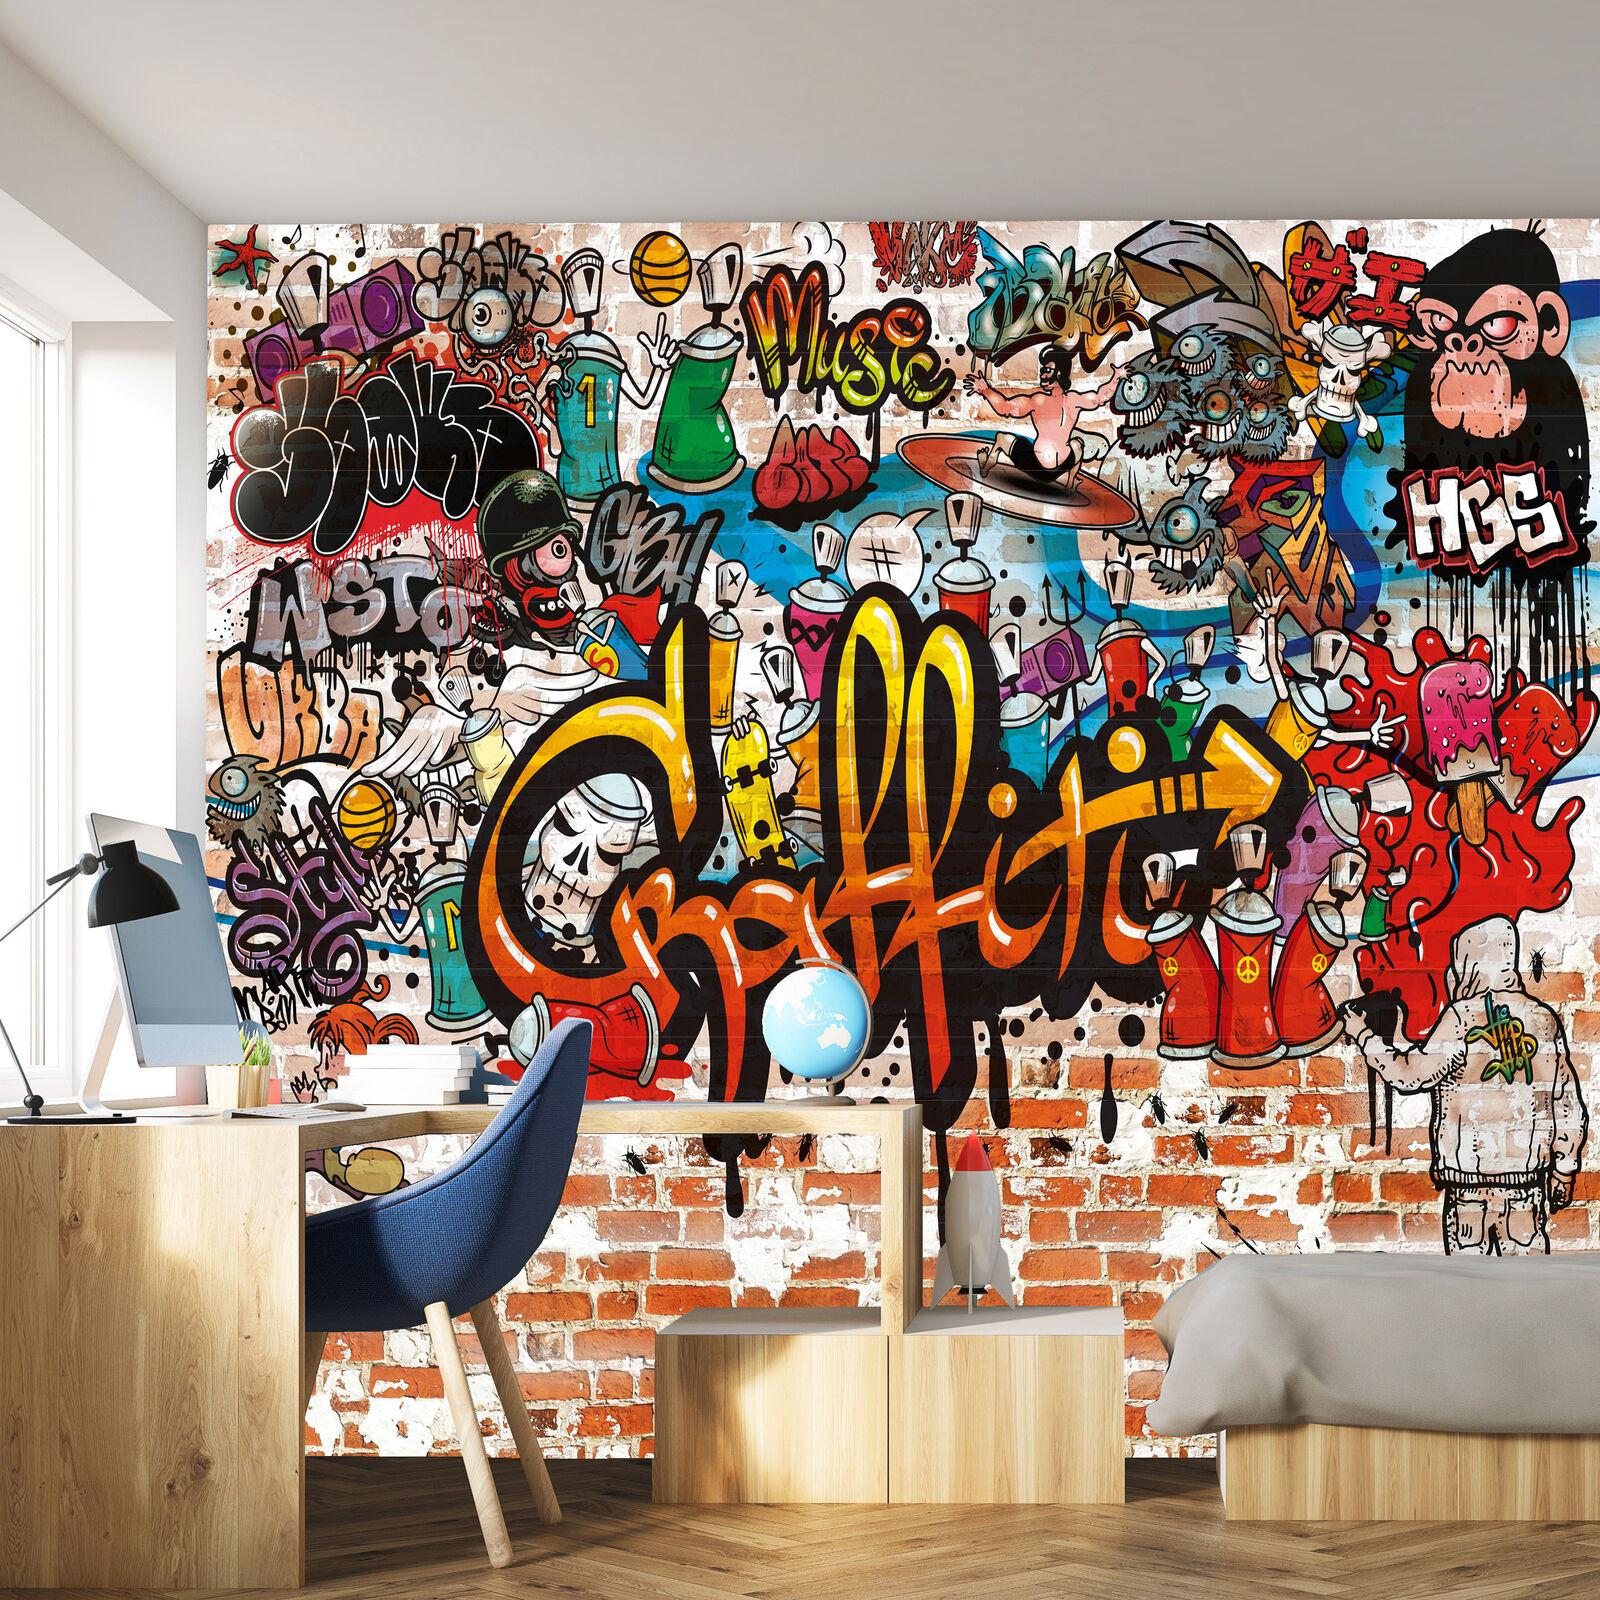 Carta da Parati Graffiti 366x254 cm Bambini parete pietra colorati ragazzi mural